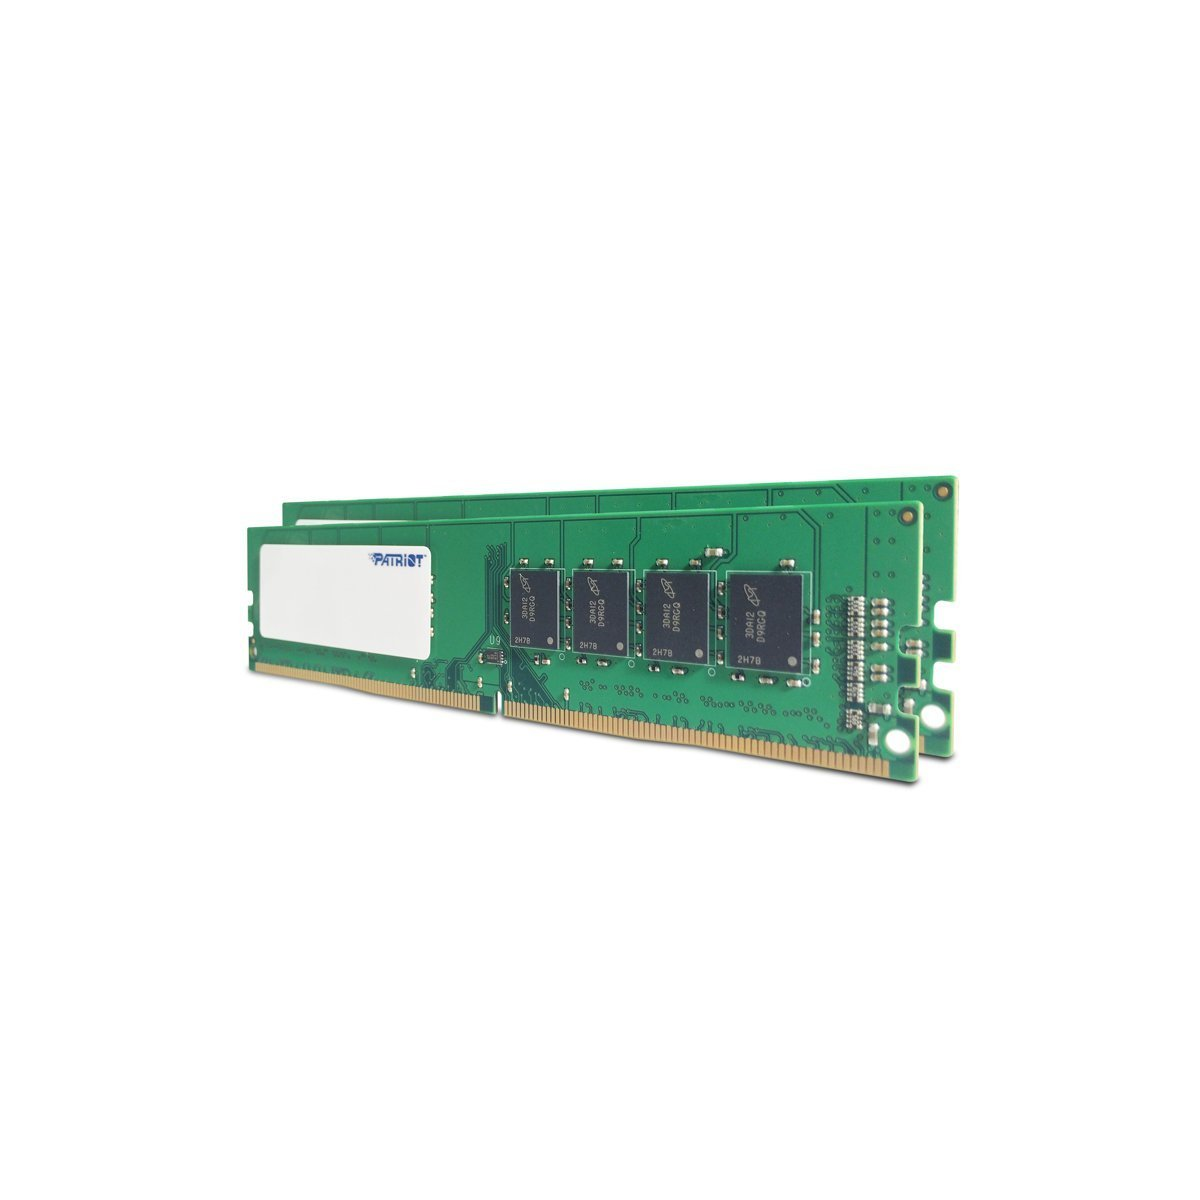 PatriotSignature Line 8GB (2 x 4GB) 288-Pin DDR4 PC4-19200 2400MHz Memory Module Kit PSD48G2400K by Patriot (Image #2)